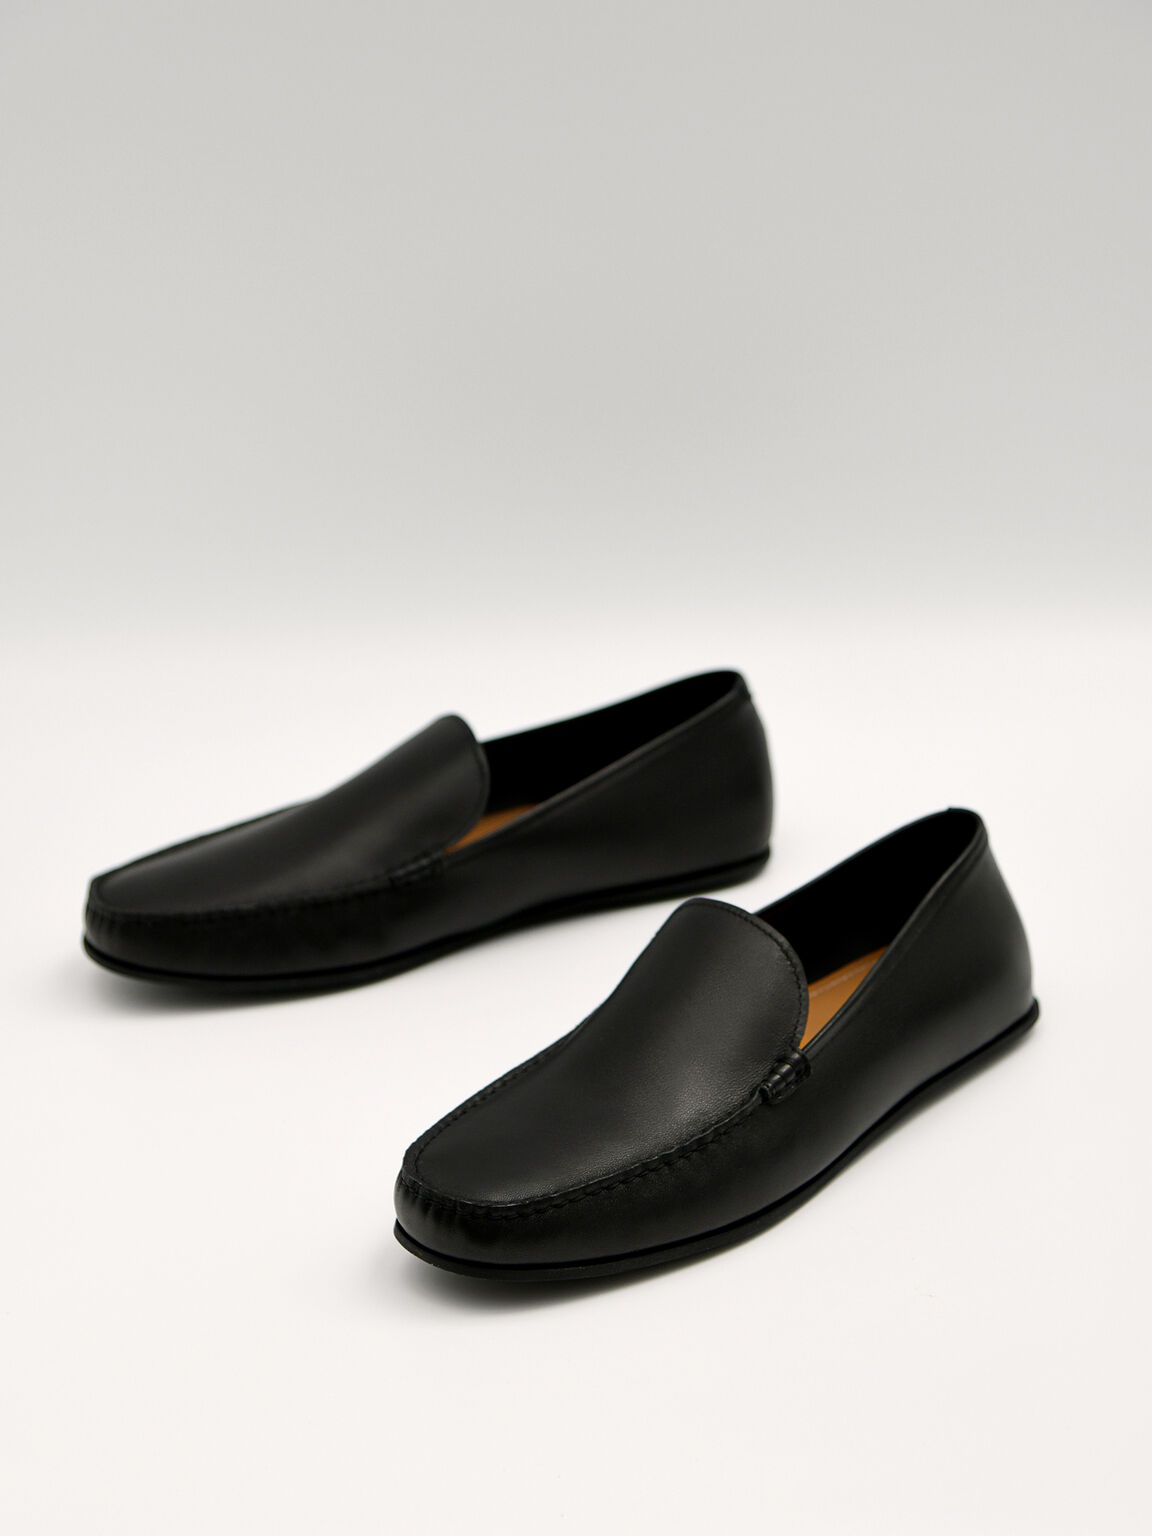 Leather Loafers, Black, hi-res